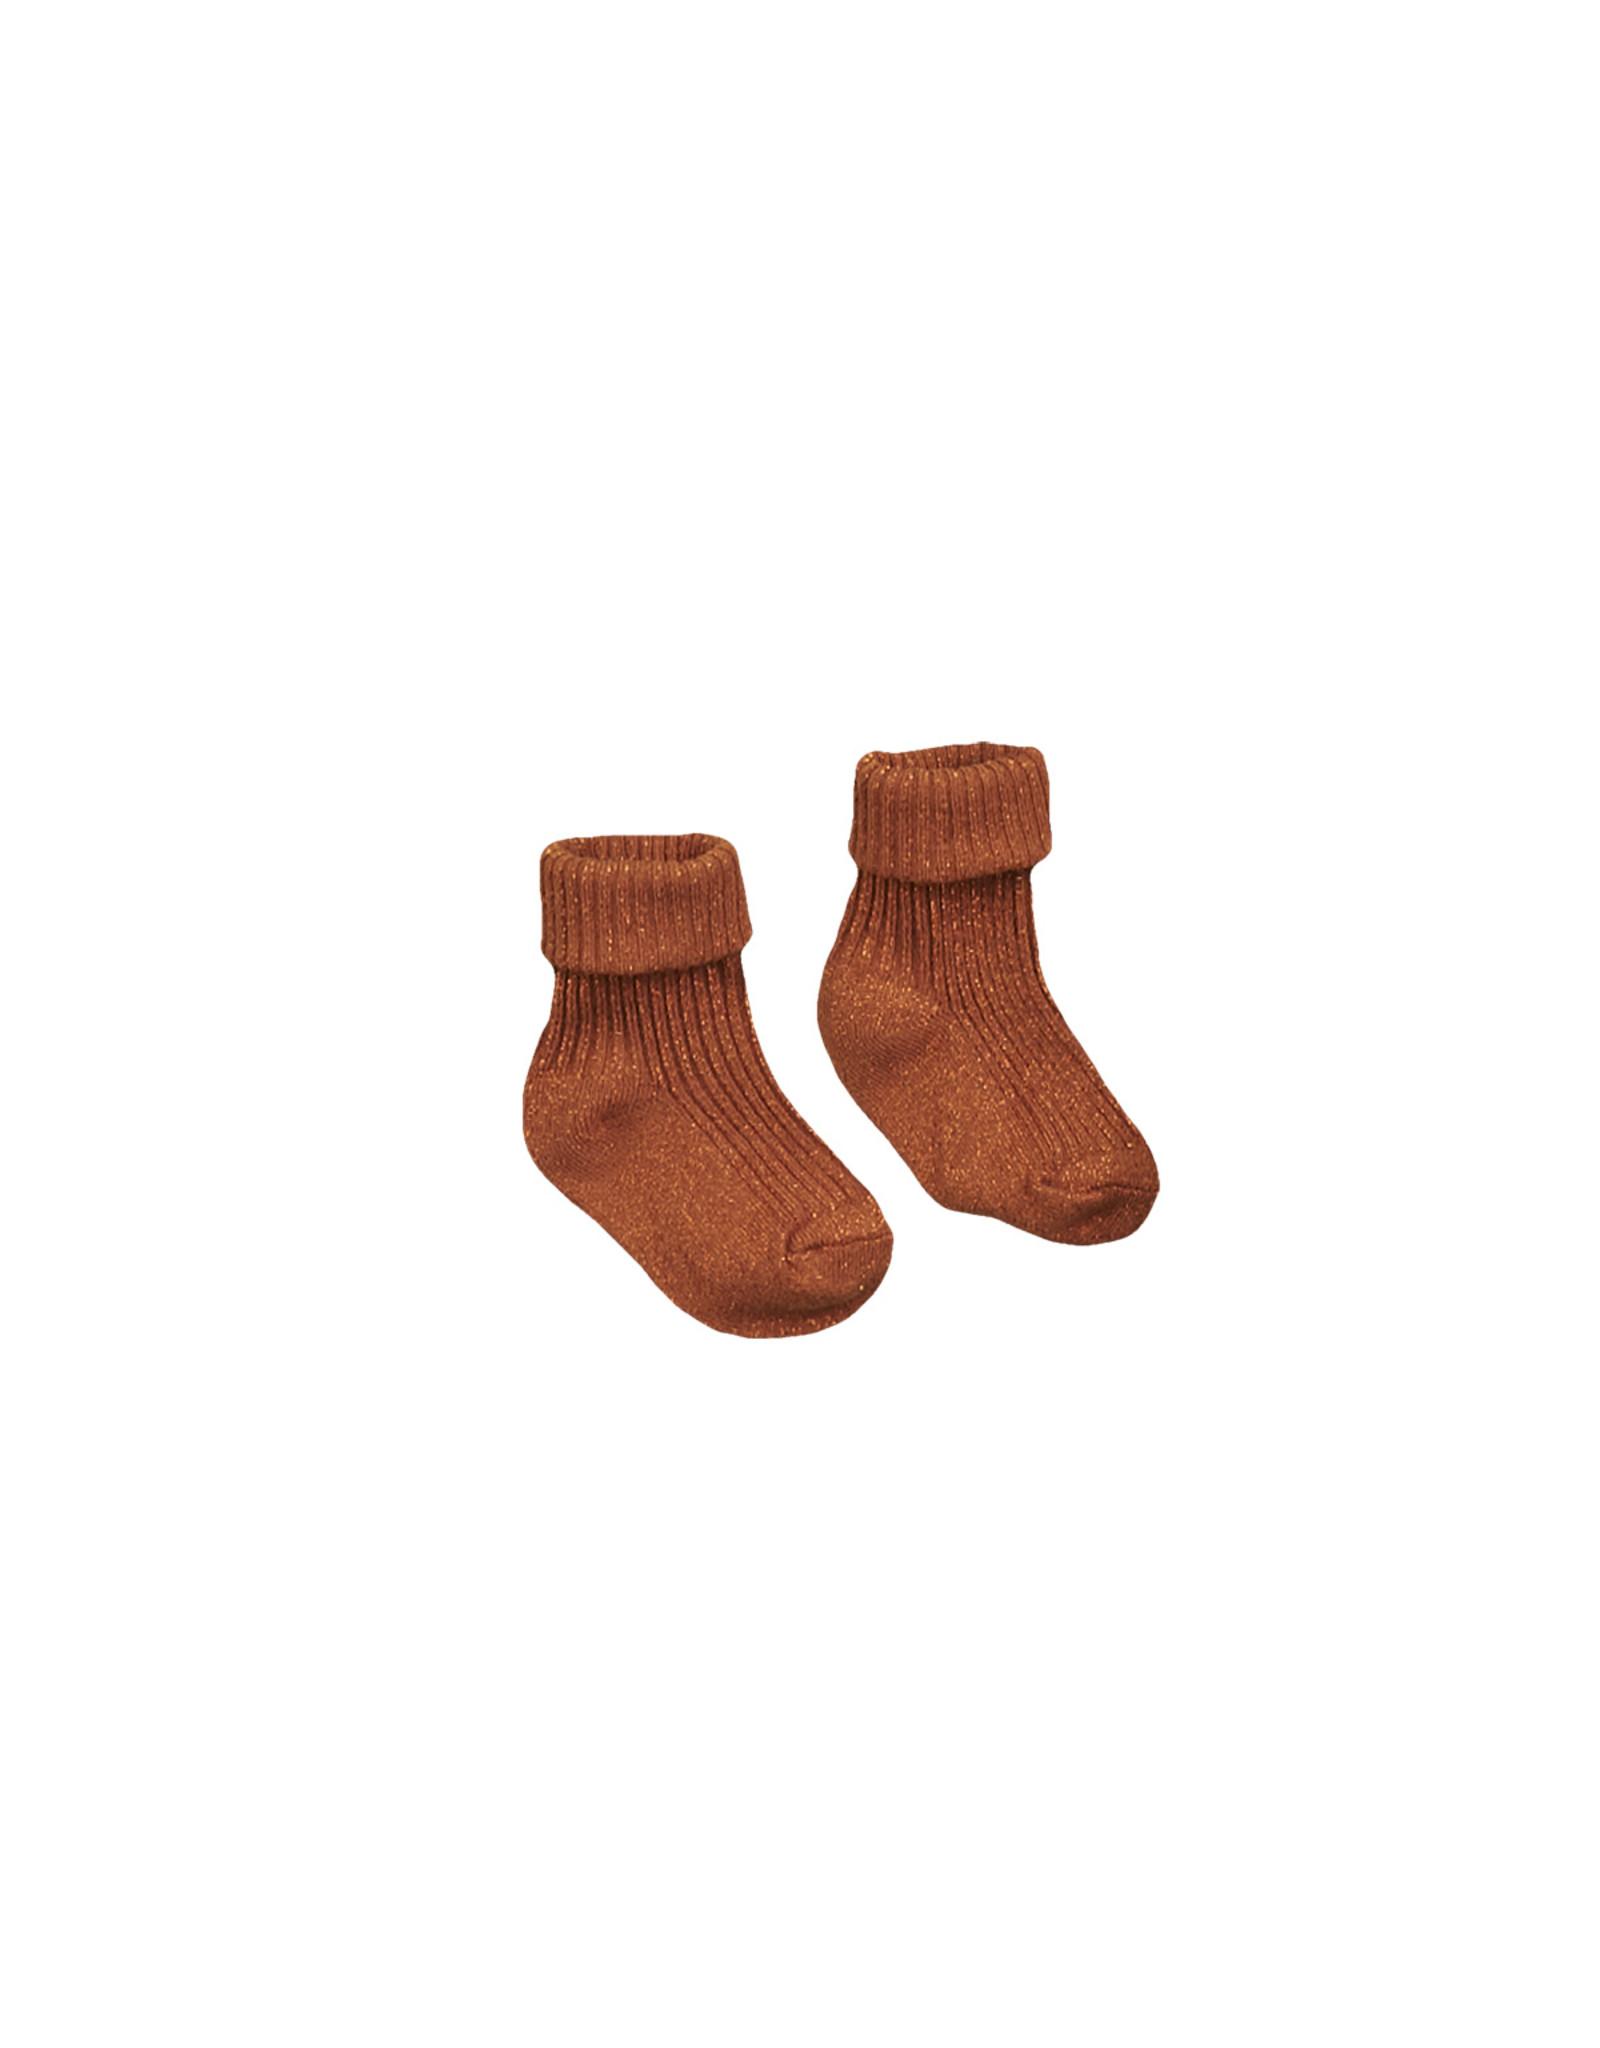 Z8 Broome copper blush maat 23 - 26